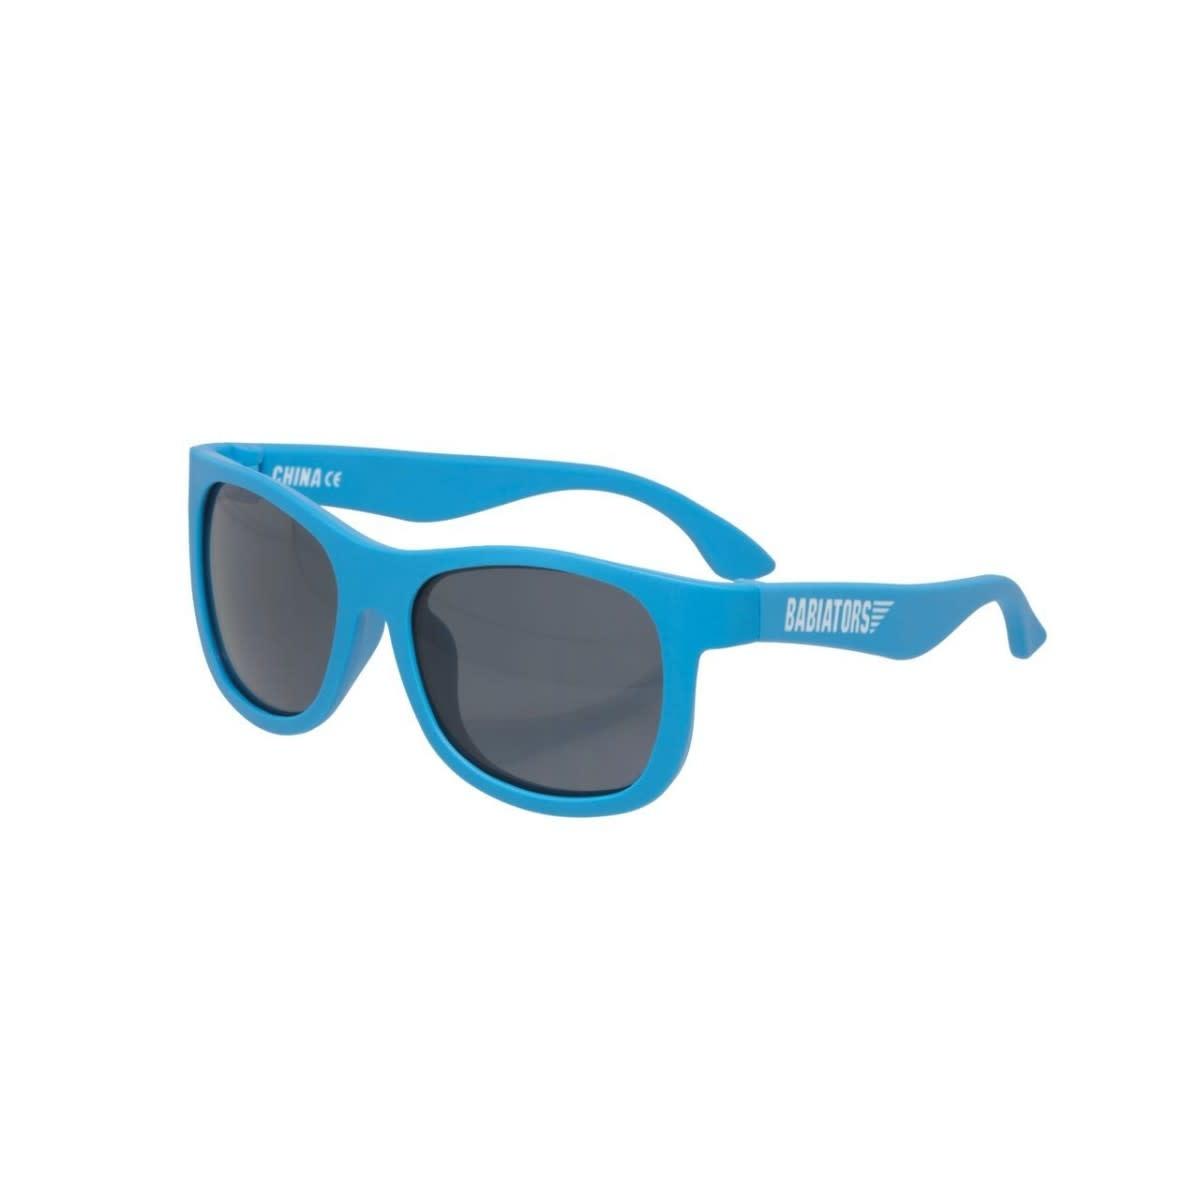 Babiators Sunglasses - Navigator (Age 0-2) Blue Crush